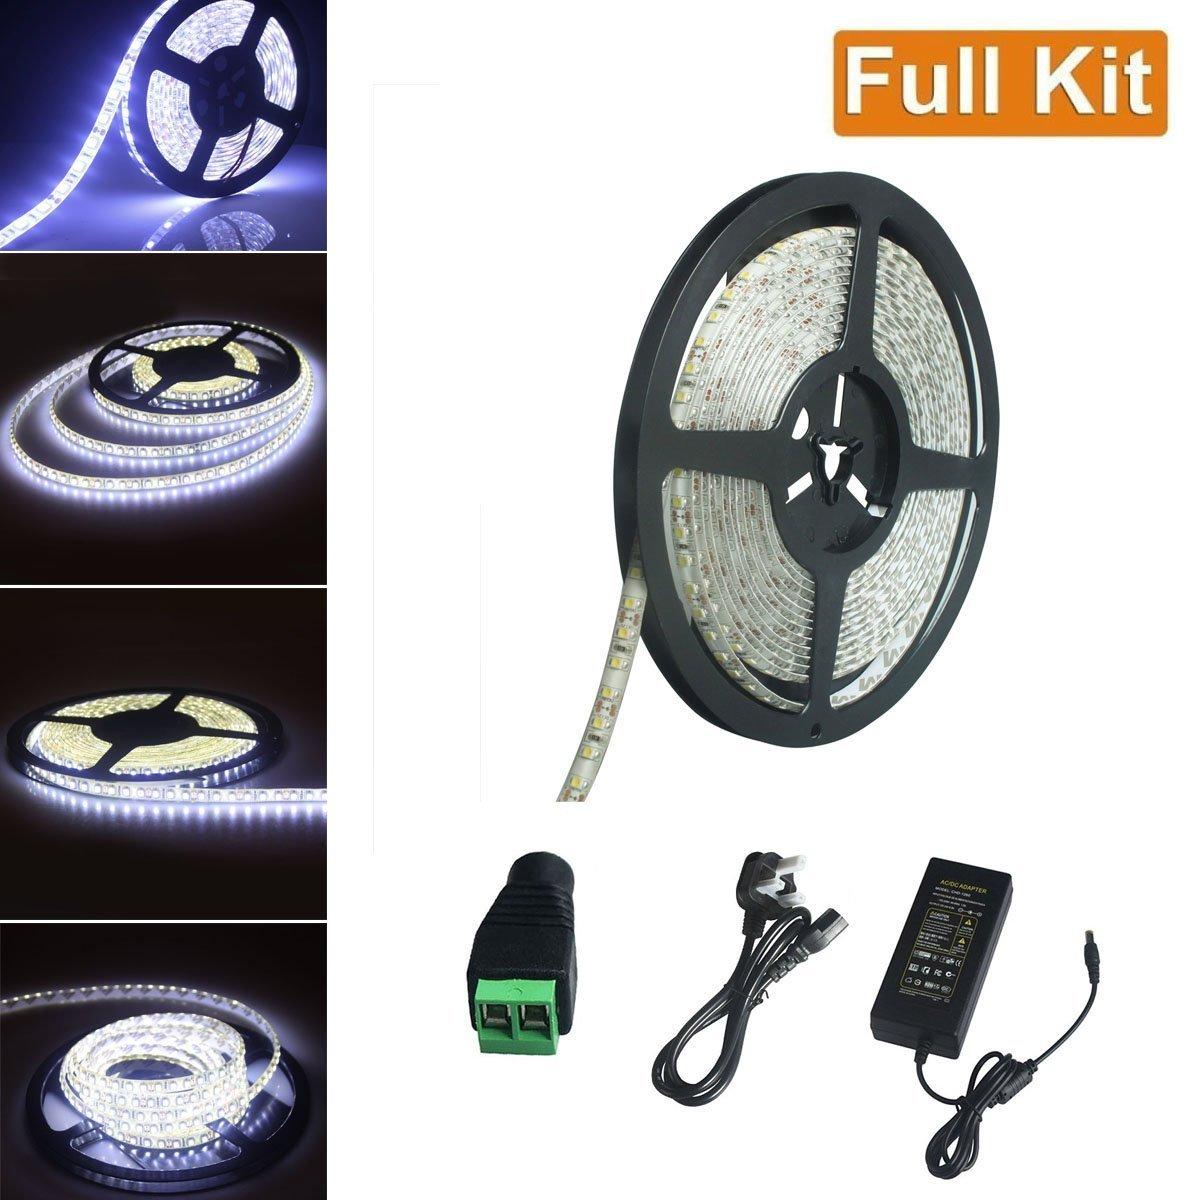 Buy sjp light led strip light kit164ft5m smd2835 ip65 waterproof sjp light led strip light kit164ft5m smd2835 ip65 waterproof dc12v aloadofball Choice Image